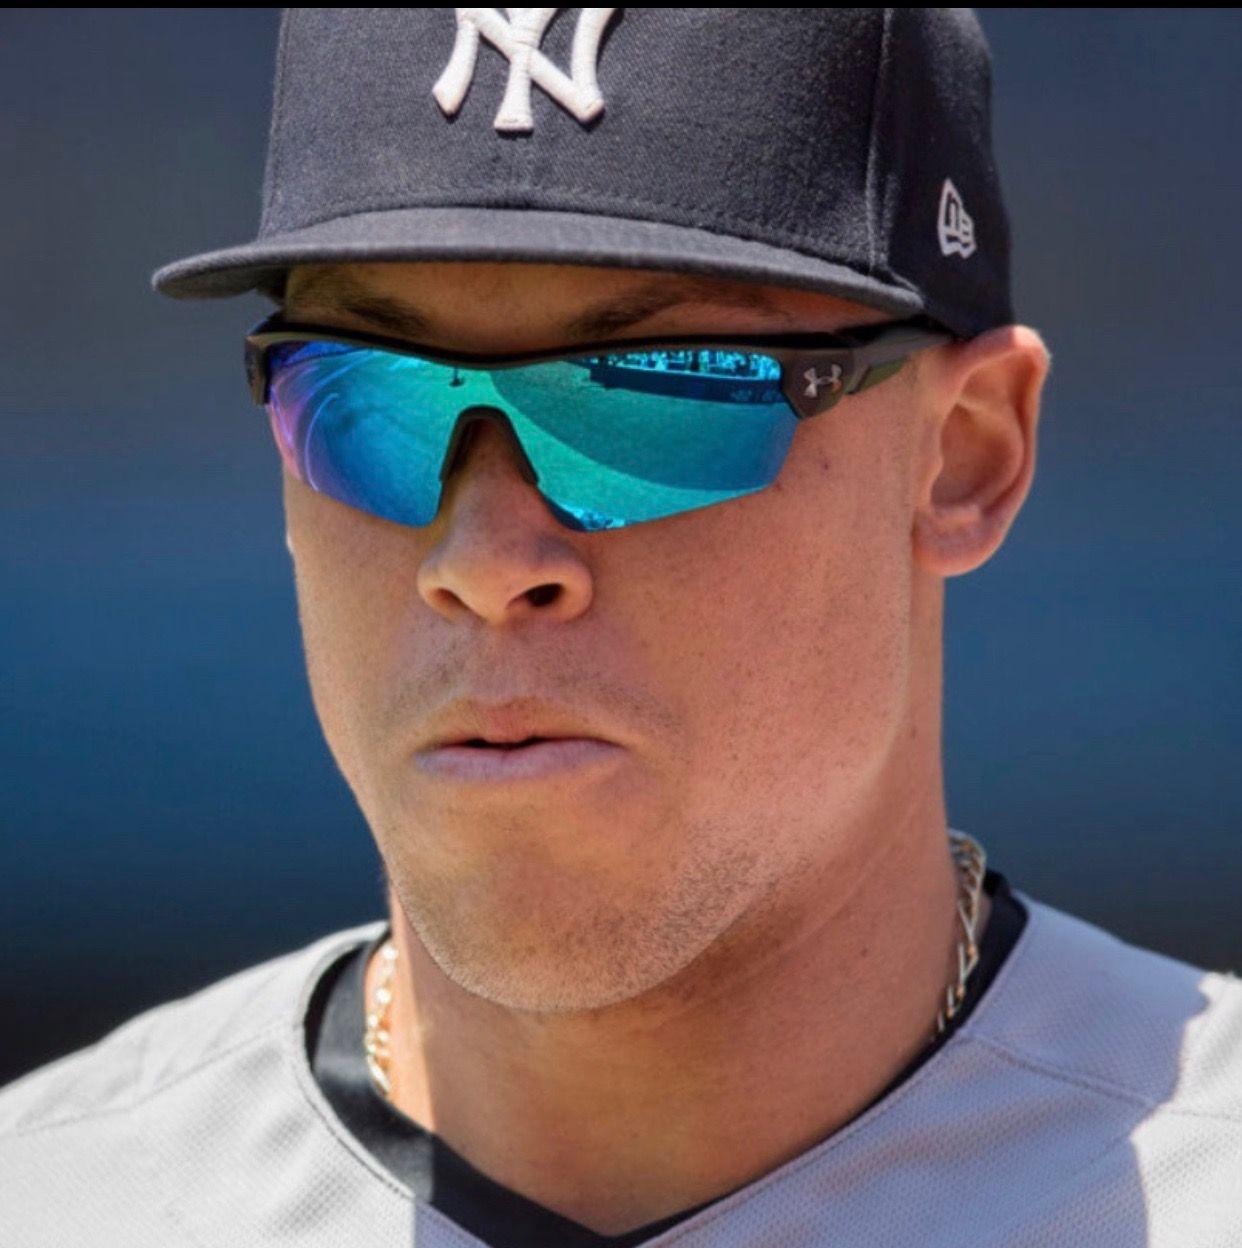 Pin by Lori Demmons on New York Yankees Baseball guys